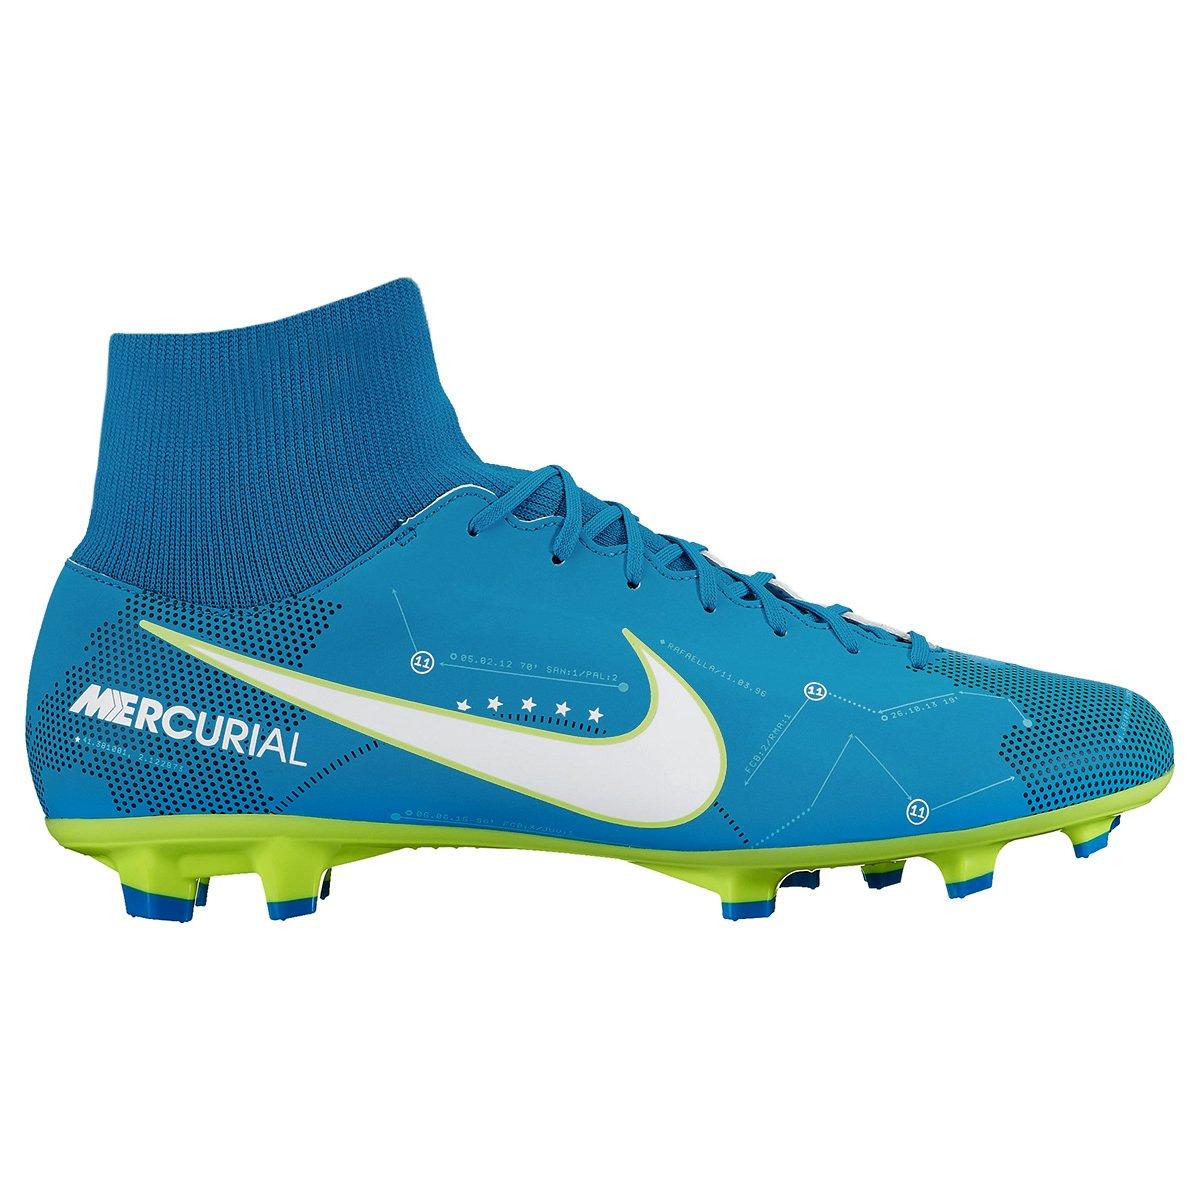 1009bdf951 Chuteira Campo Nike Mercurial Victory 6 DF Neymar Jr FG - Azul+Branco